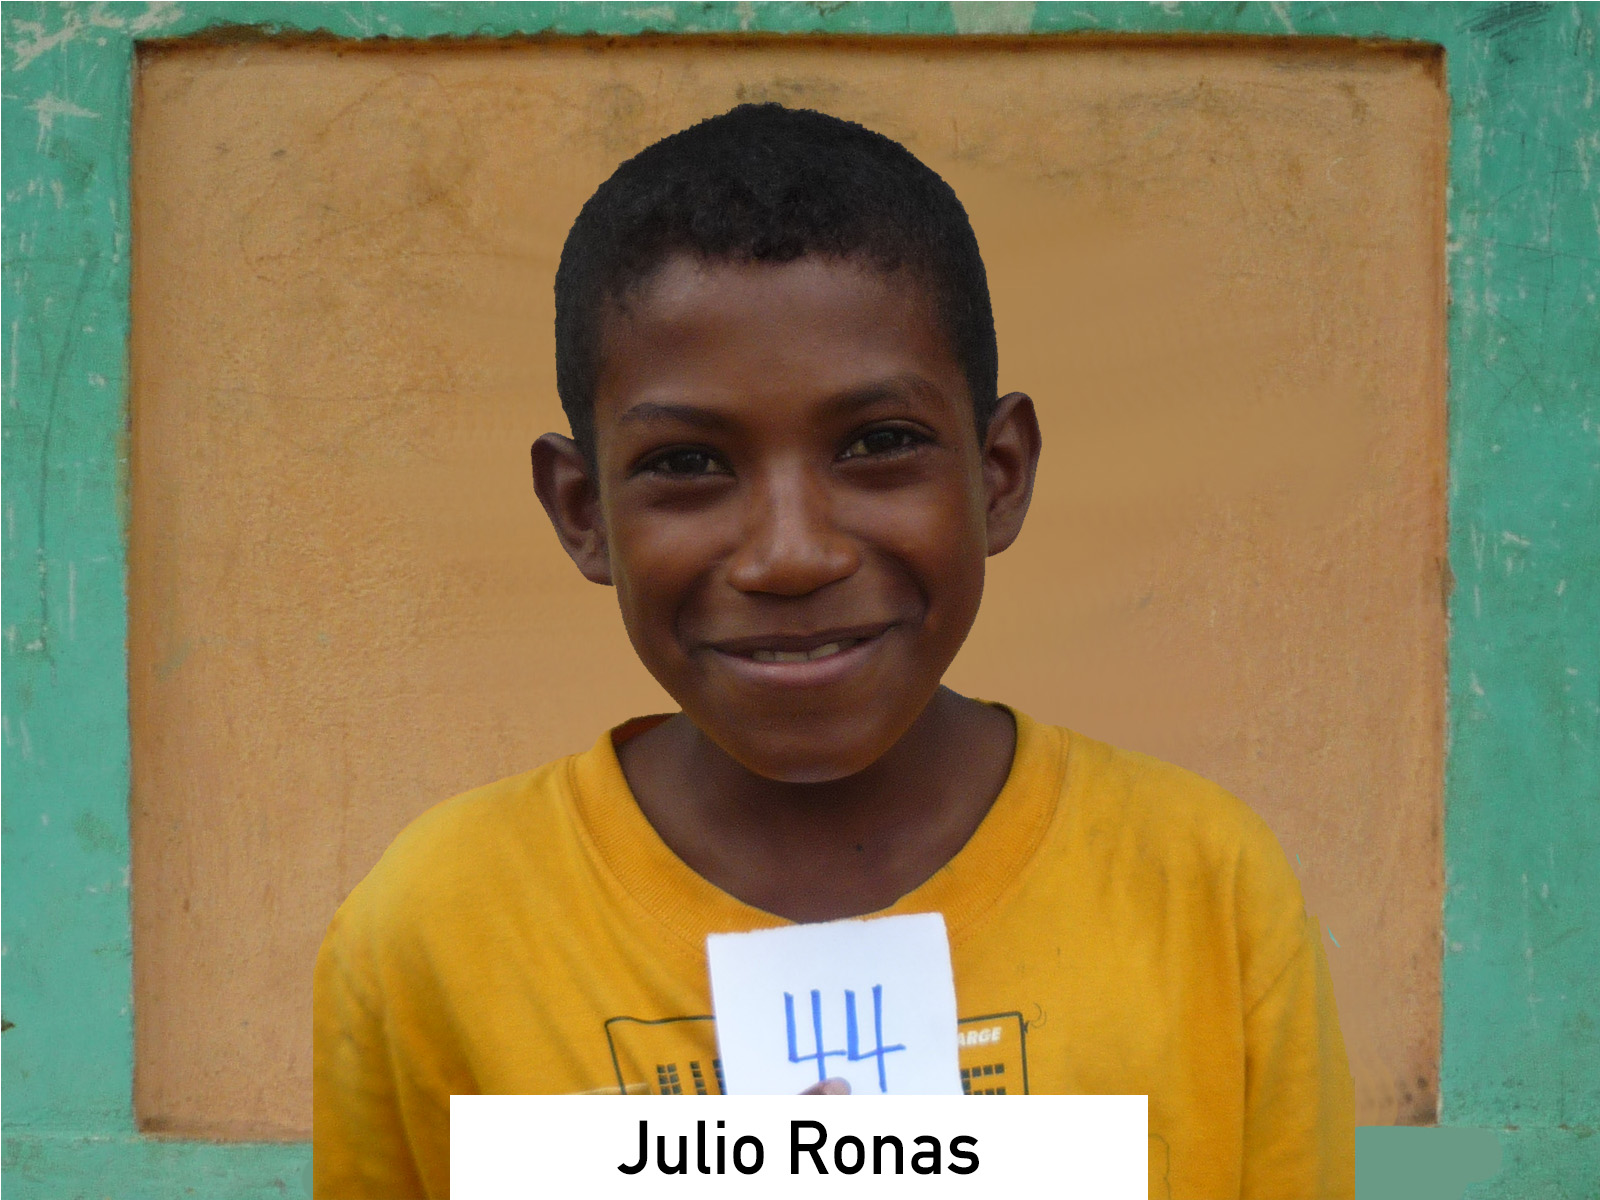 044 - Julio Ronas.jpg